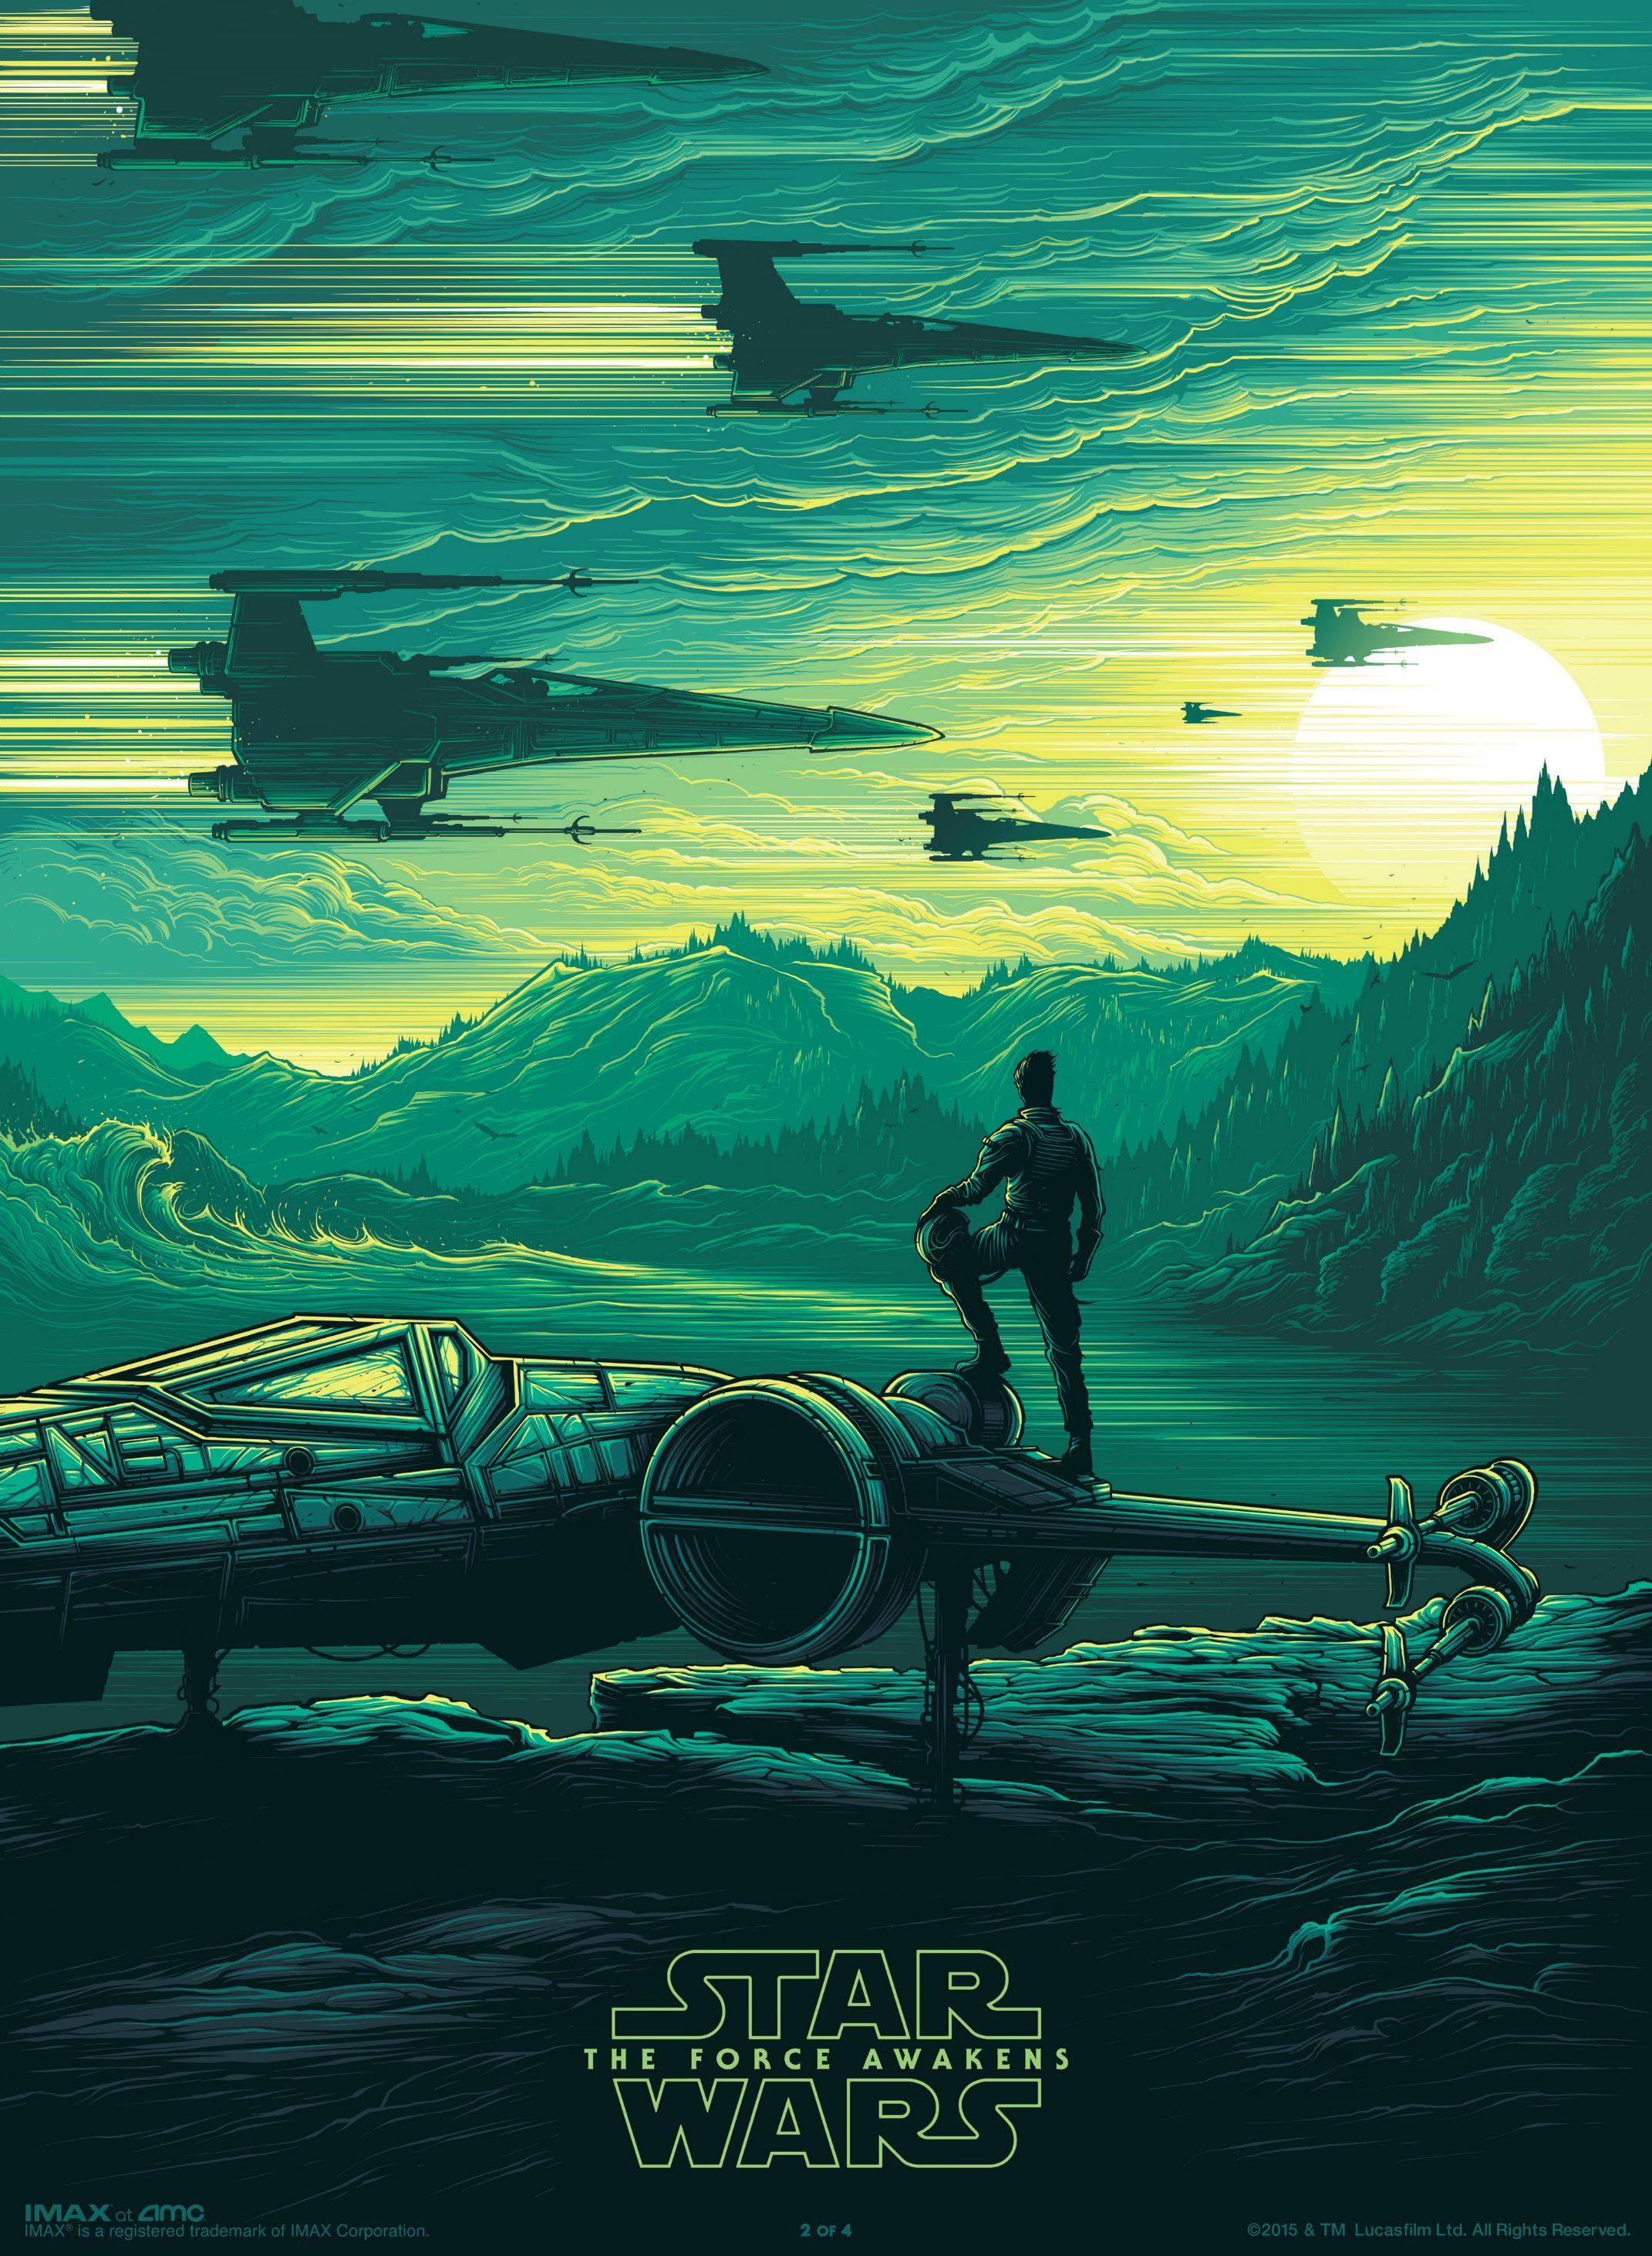 Star Wars Posters Amc Album On Imgur Star Wars Wallpaper Force Awakens Poster Star Wars Art